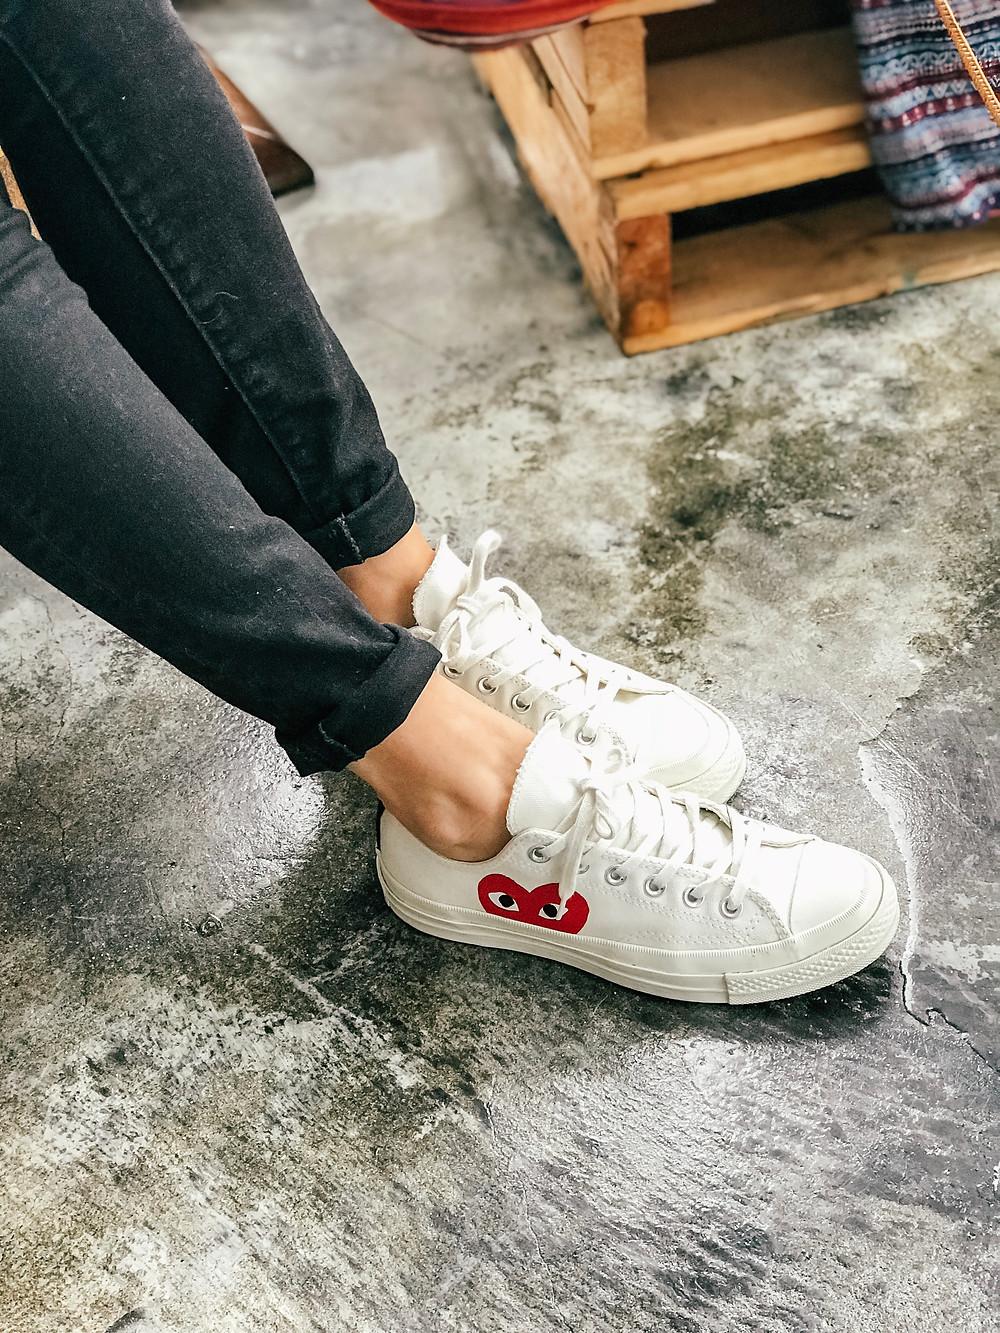 Superga 2750 Cotu Classic Sneaker       >>>>  Buy it here ($)